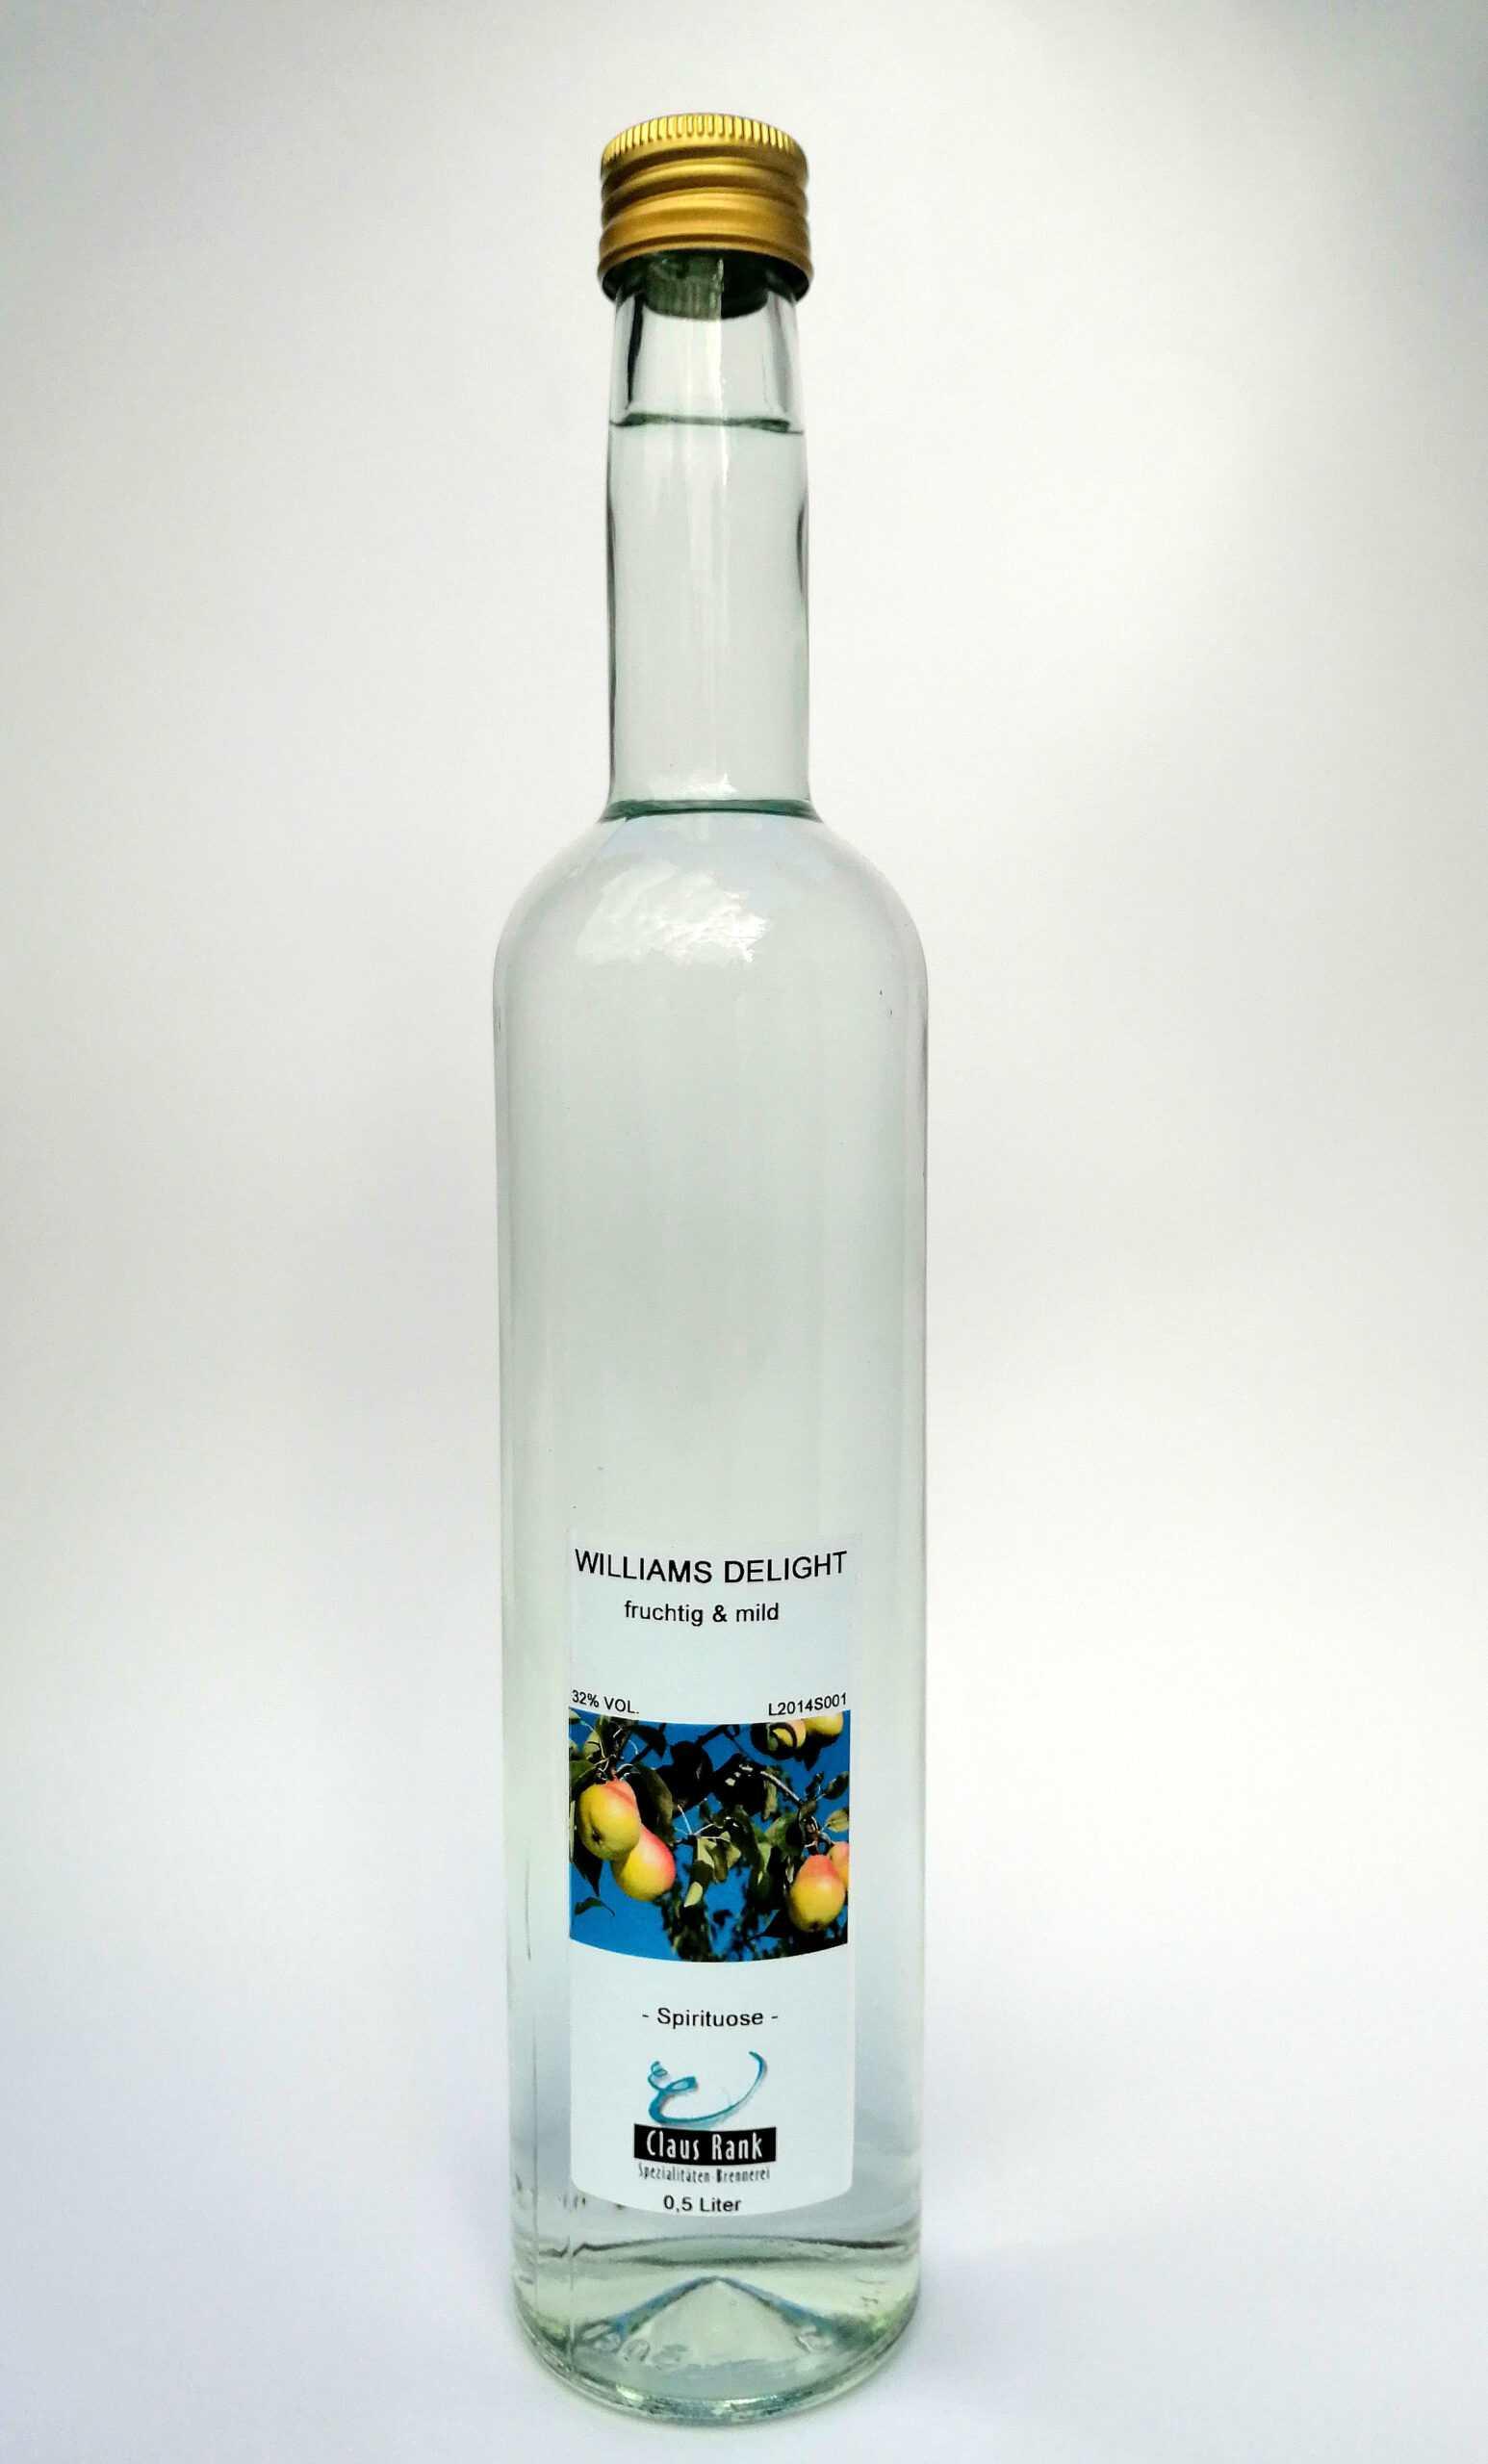 Williams-Delight_0,5 Liter